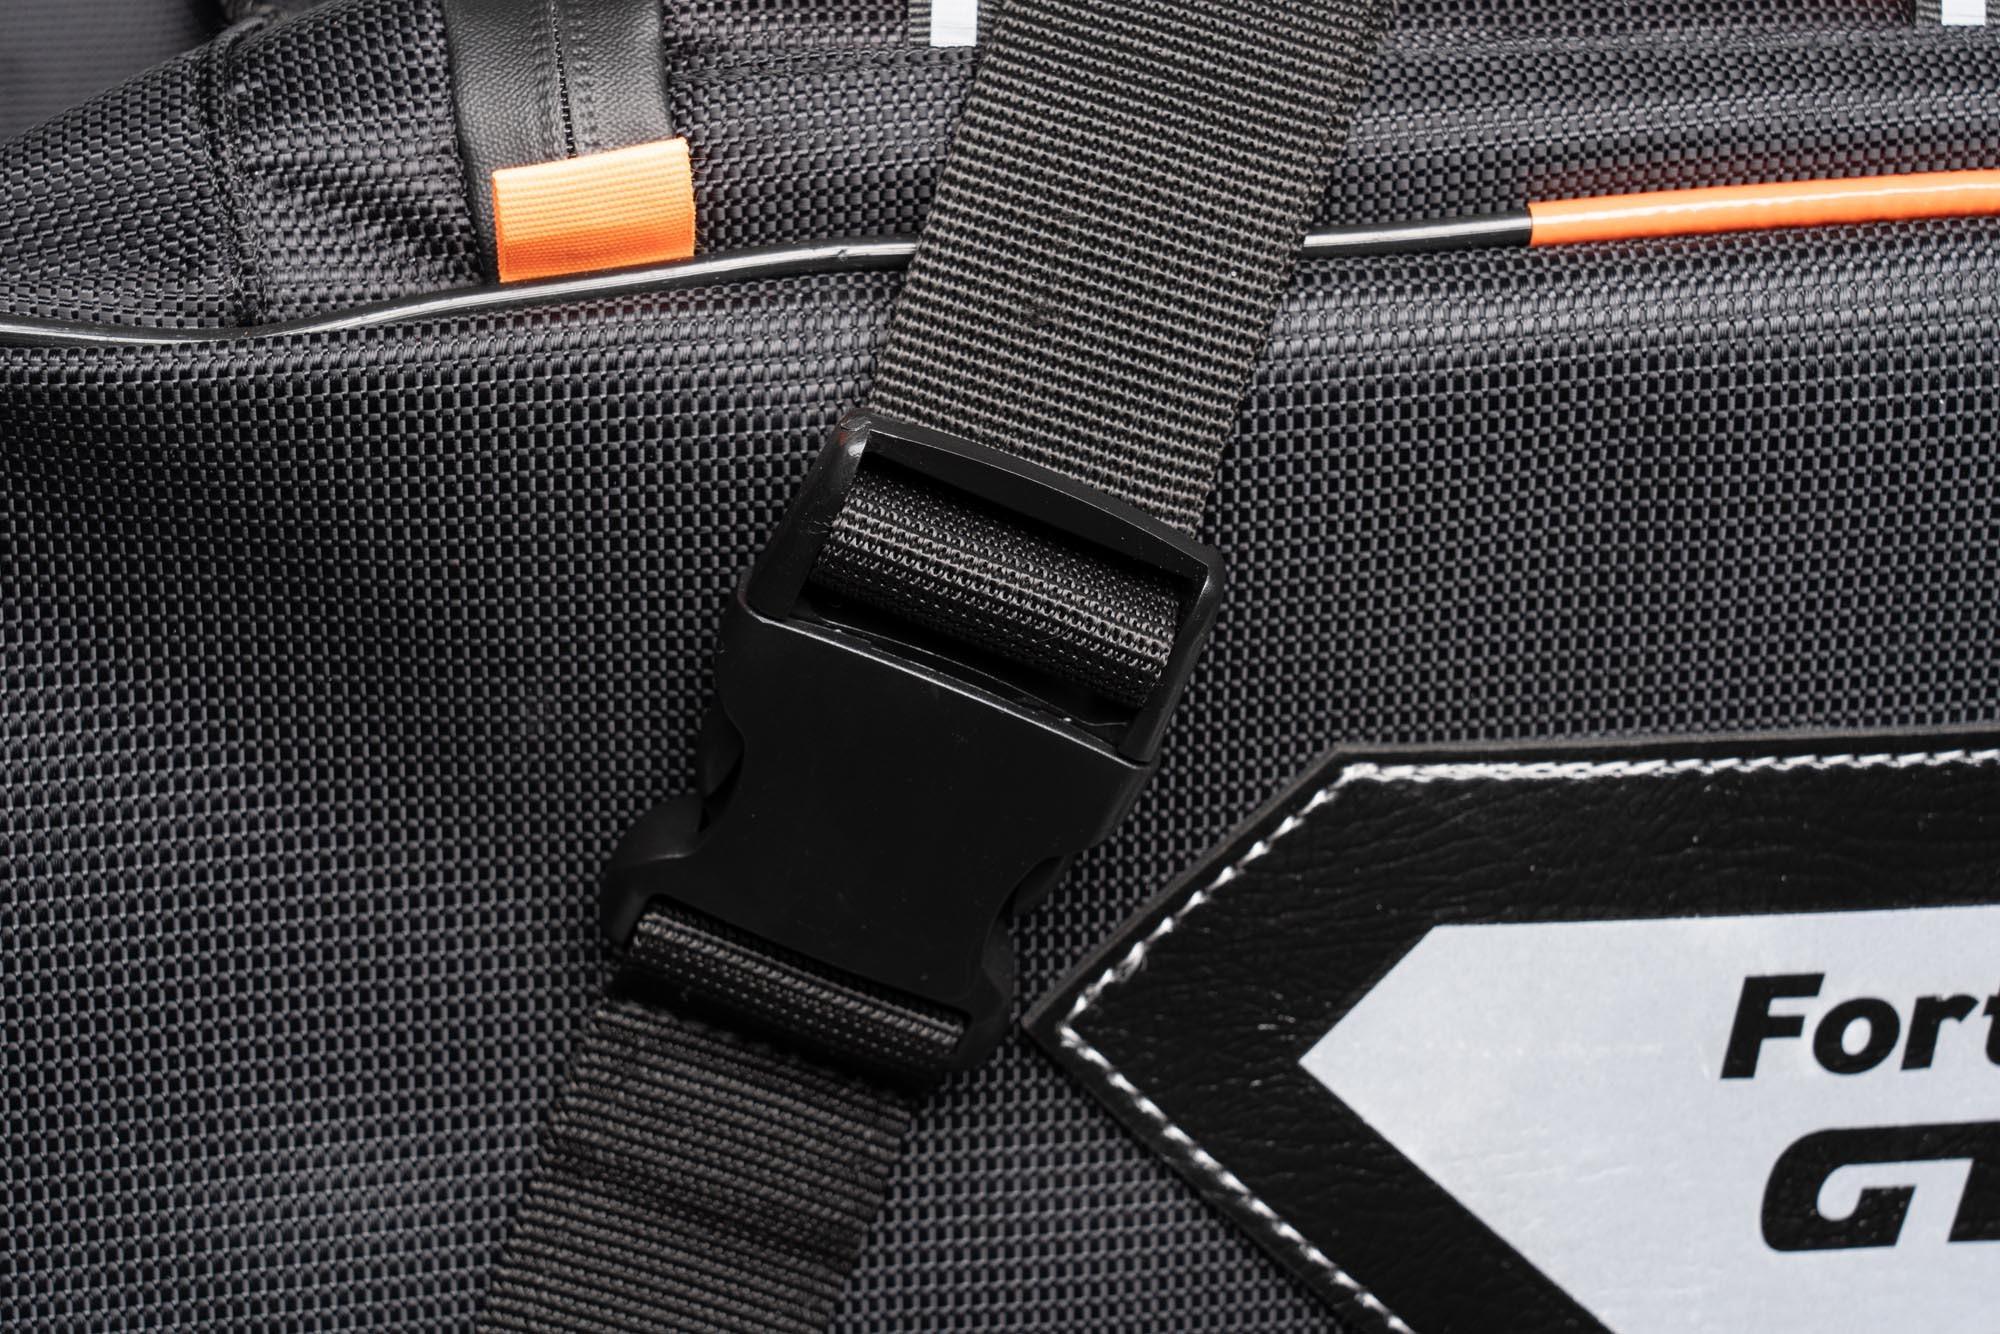 Closeup of 70086 Sentor bag strap buckles